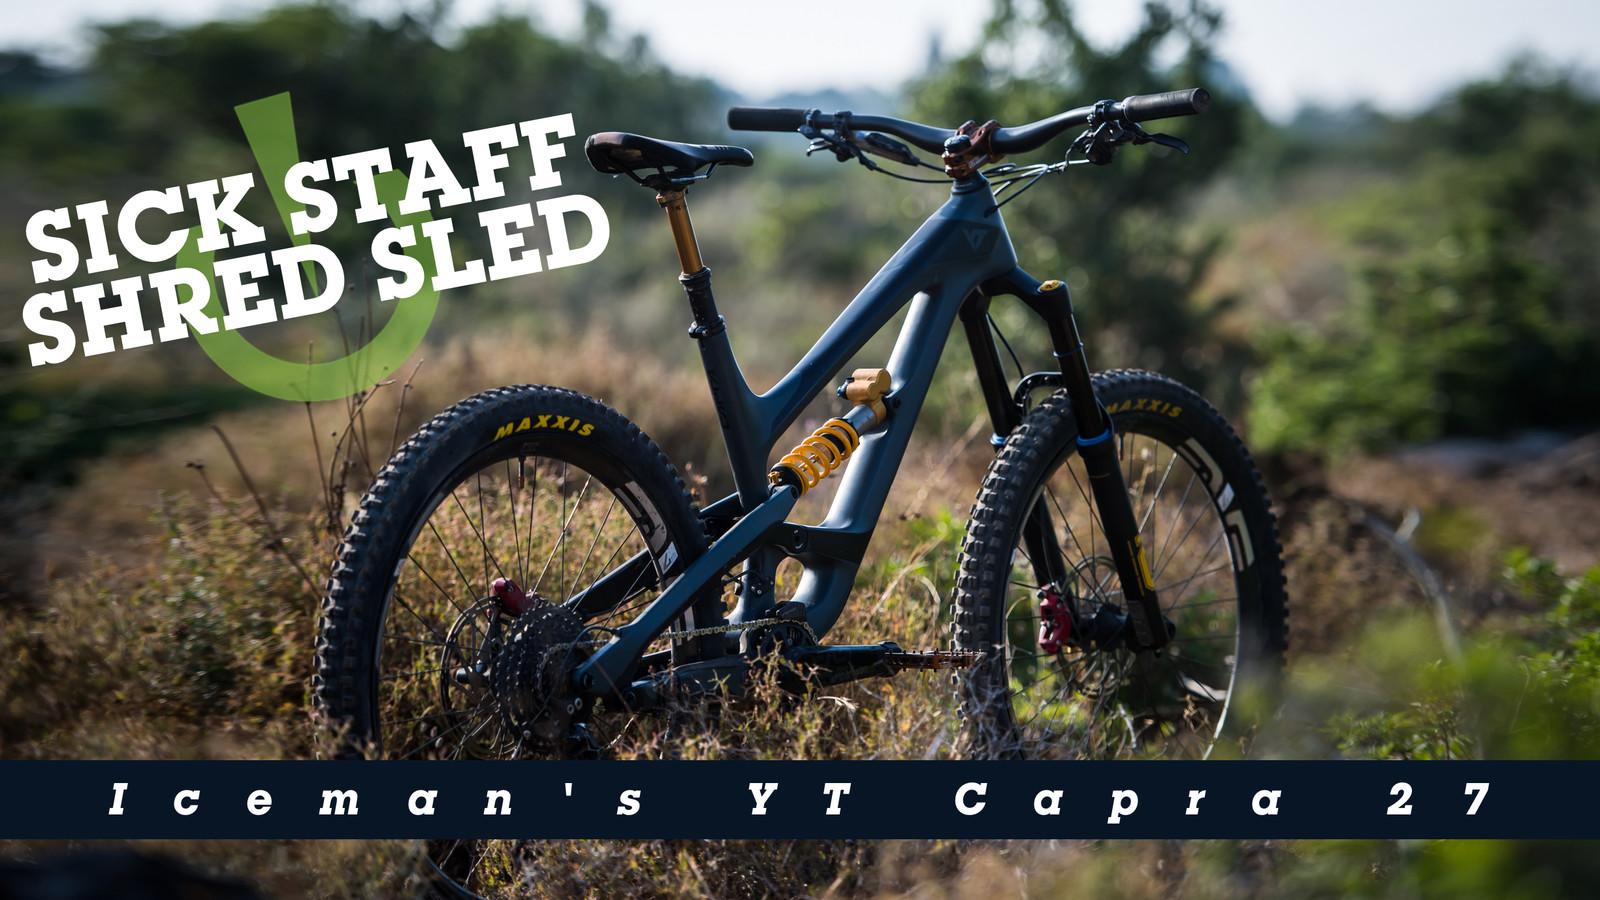 Sick Staff Shred Sleds: Iceman's YT Capra 27